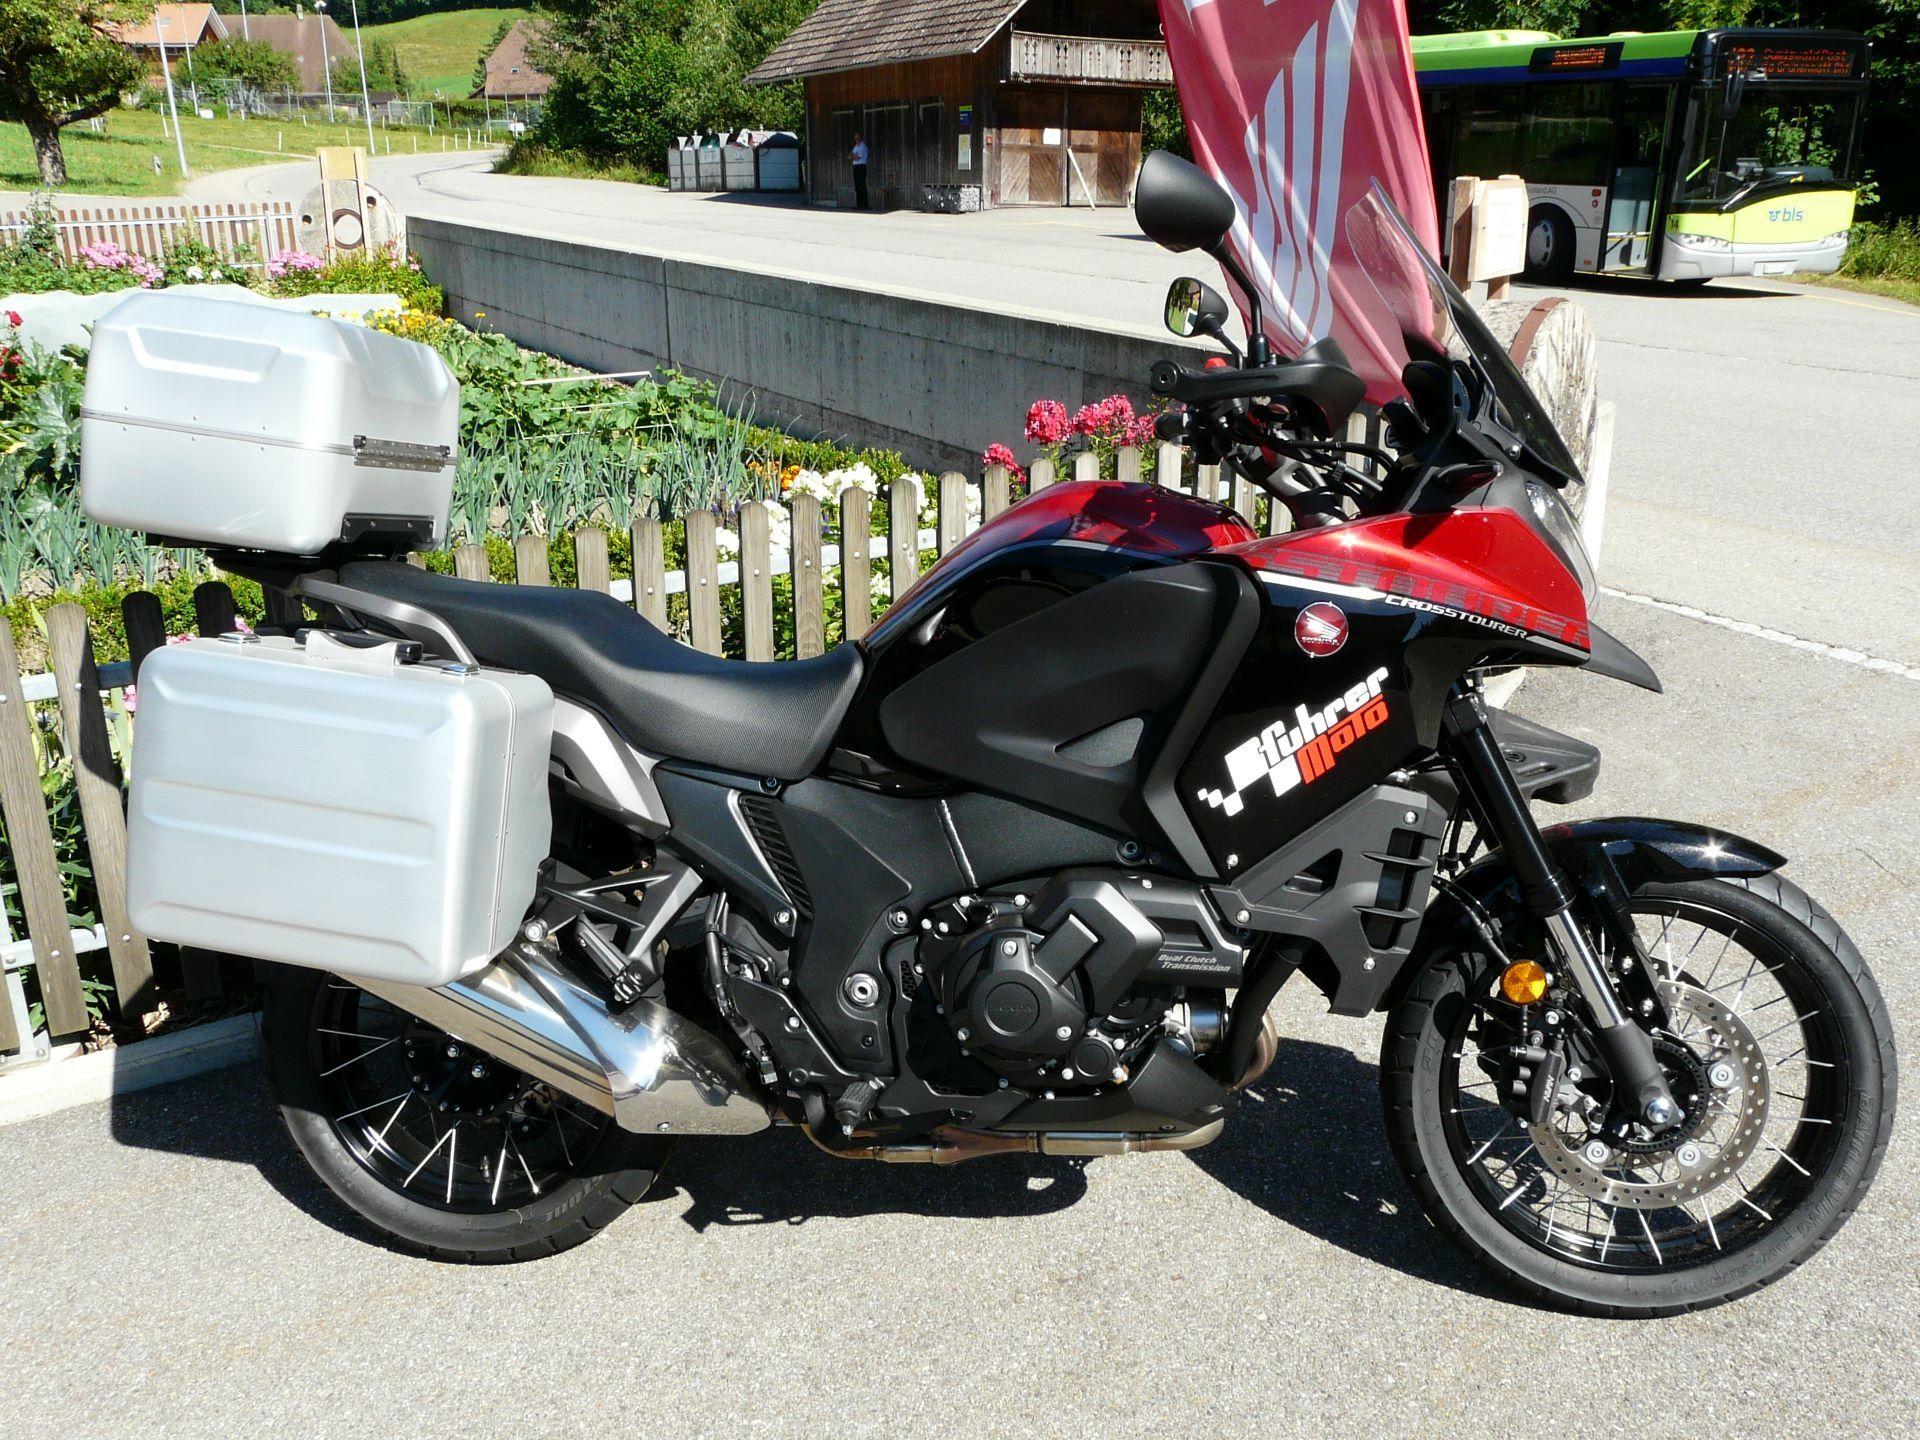 motorrad occasion kaufen honda vfr 1200 xd crosstourer dual clutch abs fuhrer moto heimisbach. Black Bedroom Furniture Sets. Home Design Ideas